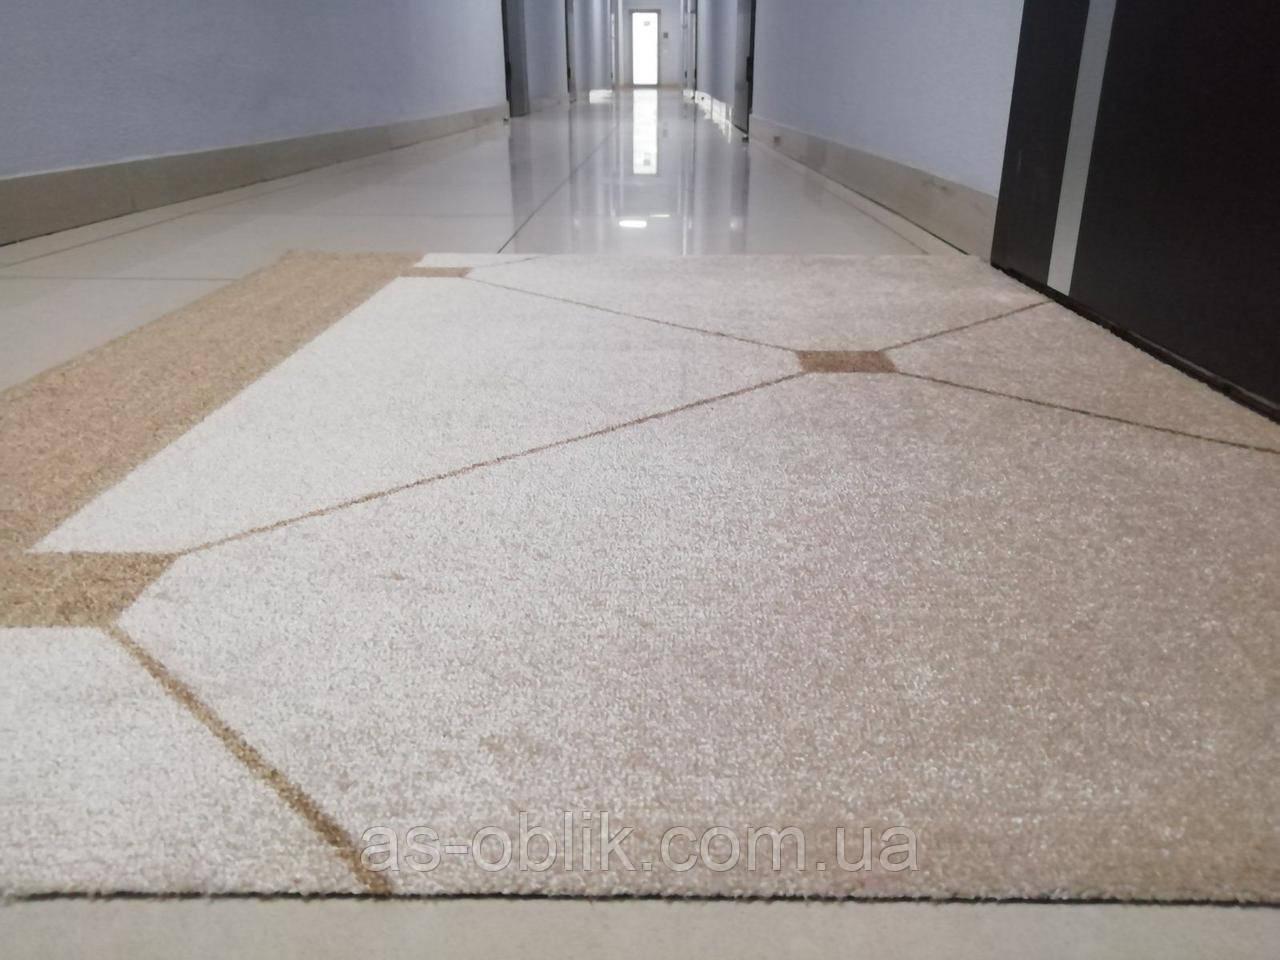 Влагопоглощающий коврик бежевый 1110х910 мм